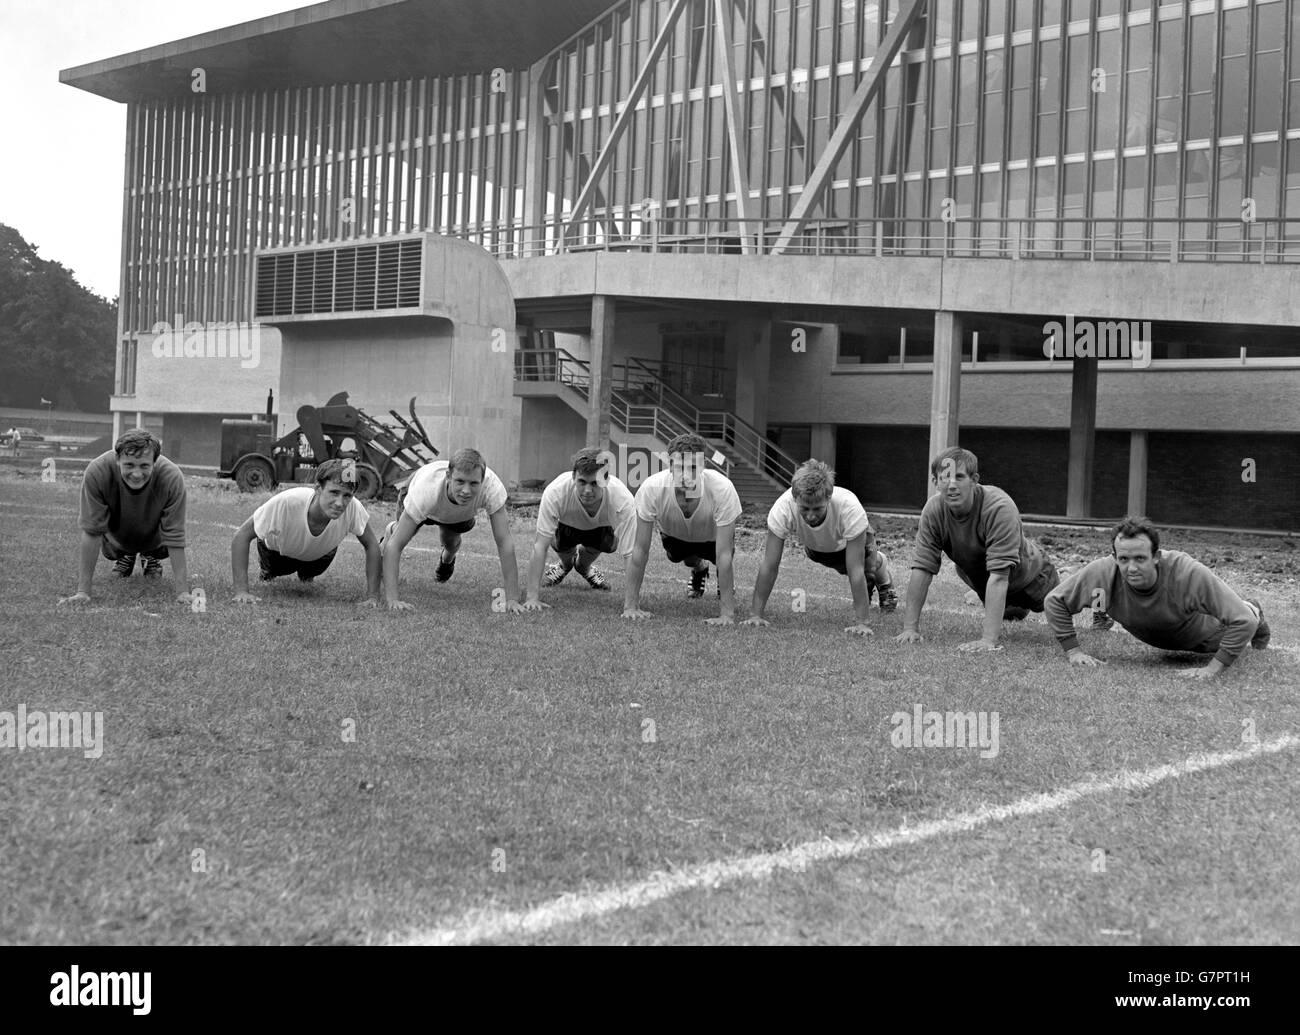 Soccer - Crystal Palace Training - National Recreation Centre, Crystal Palace, London - Stock Image